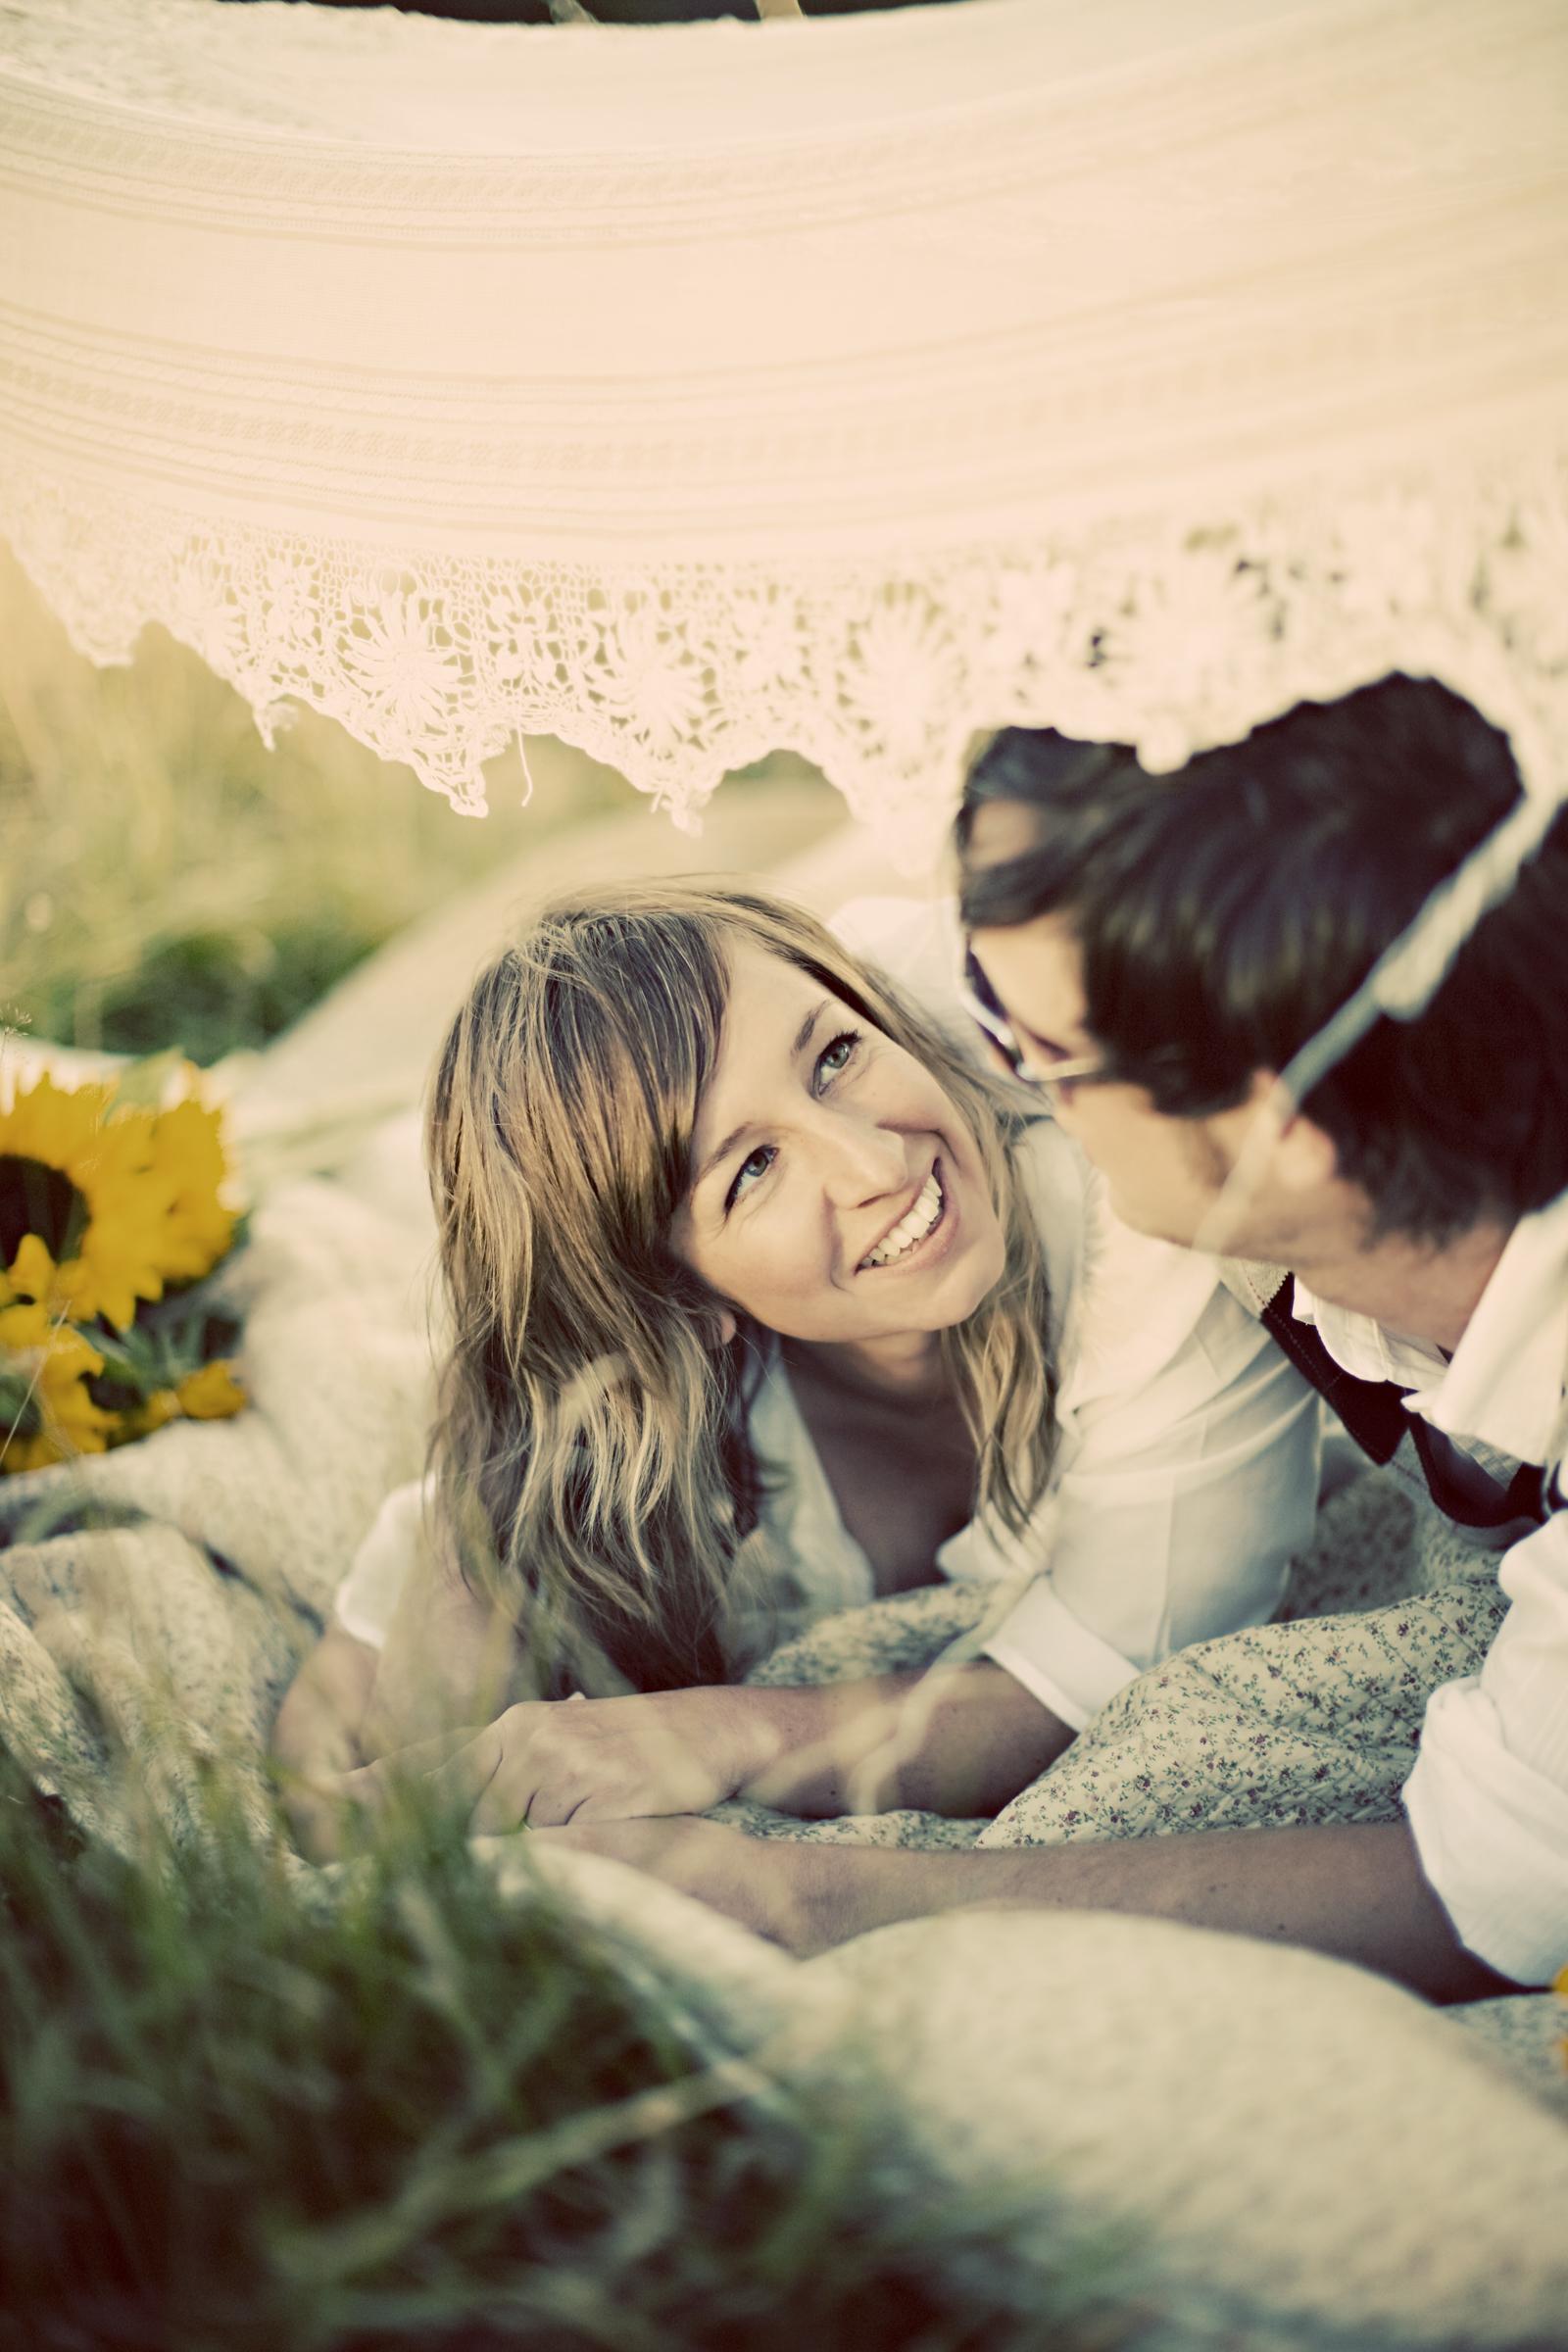 Sharon & Eric - An Engagement Shoot